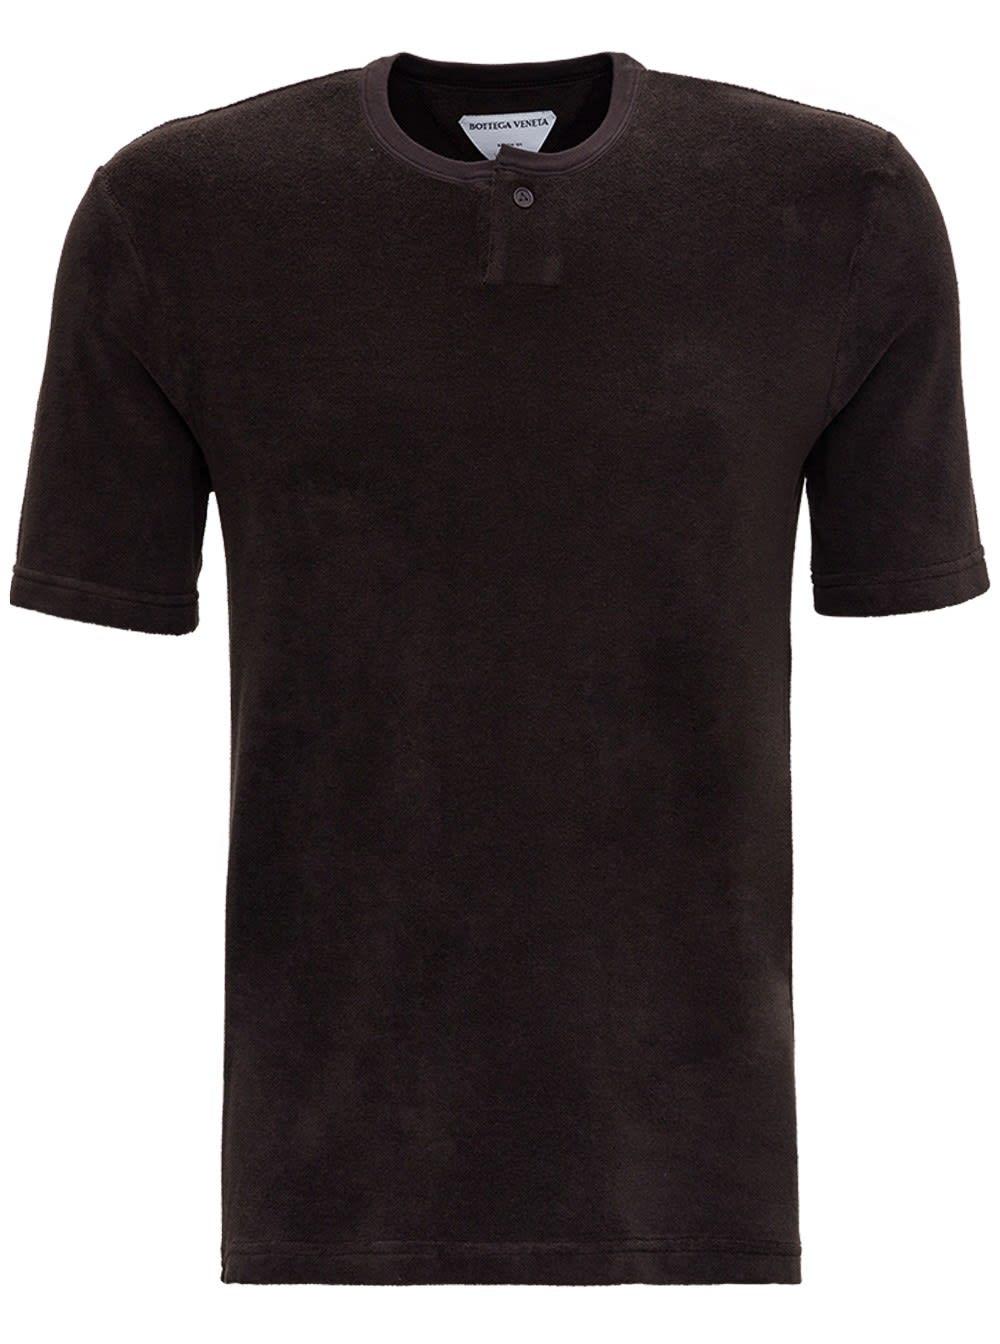 Bottega Veneta BROWN TERRY CLOTH T-SHIRT